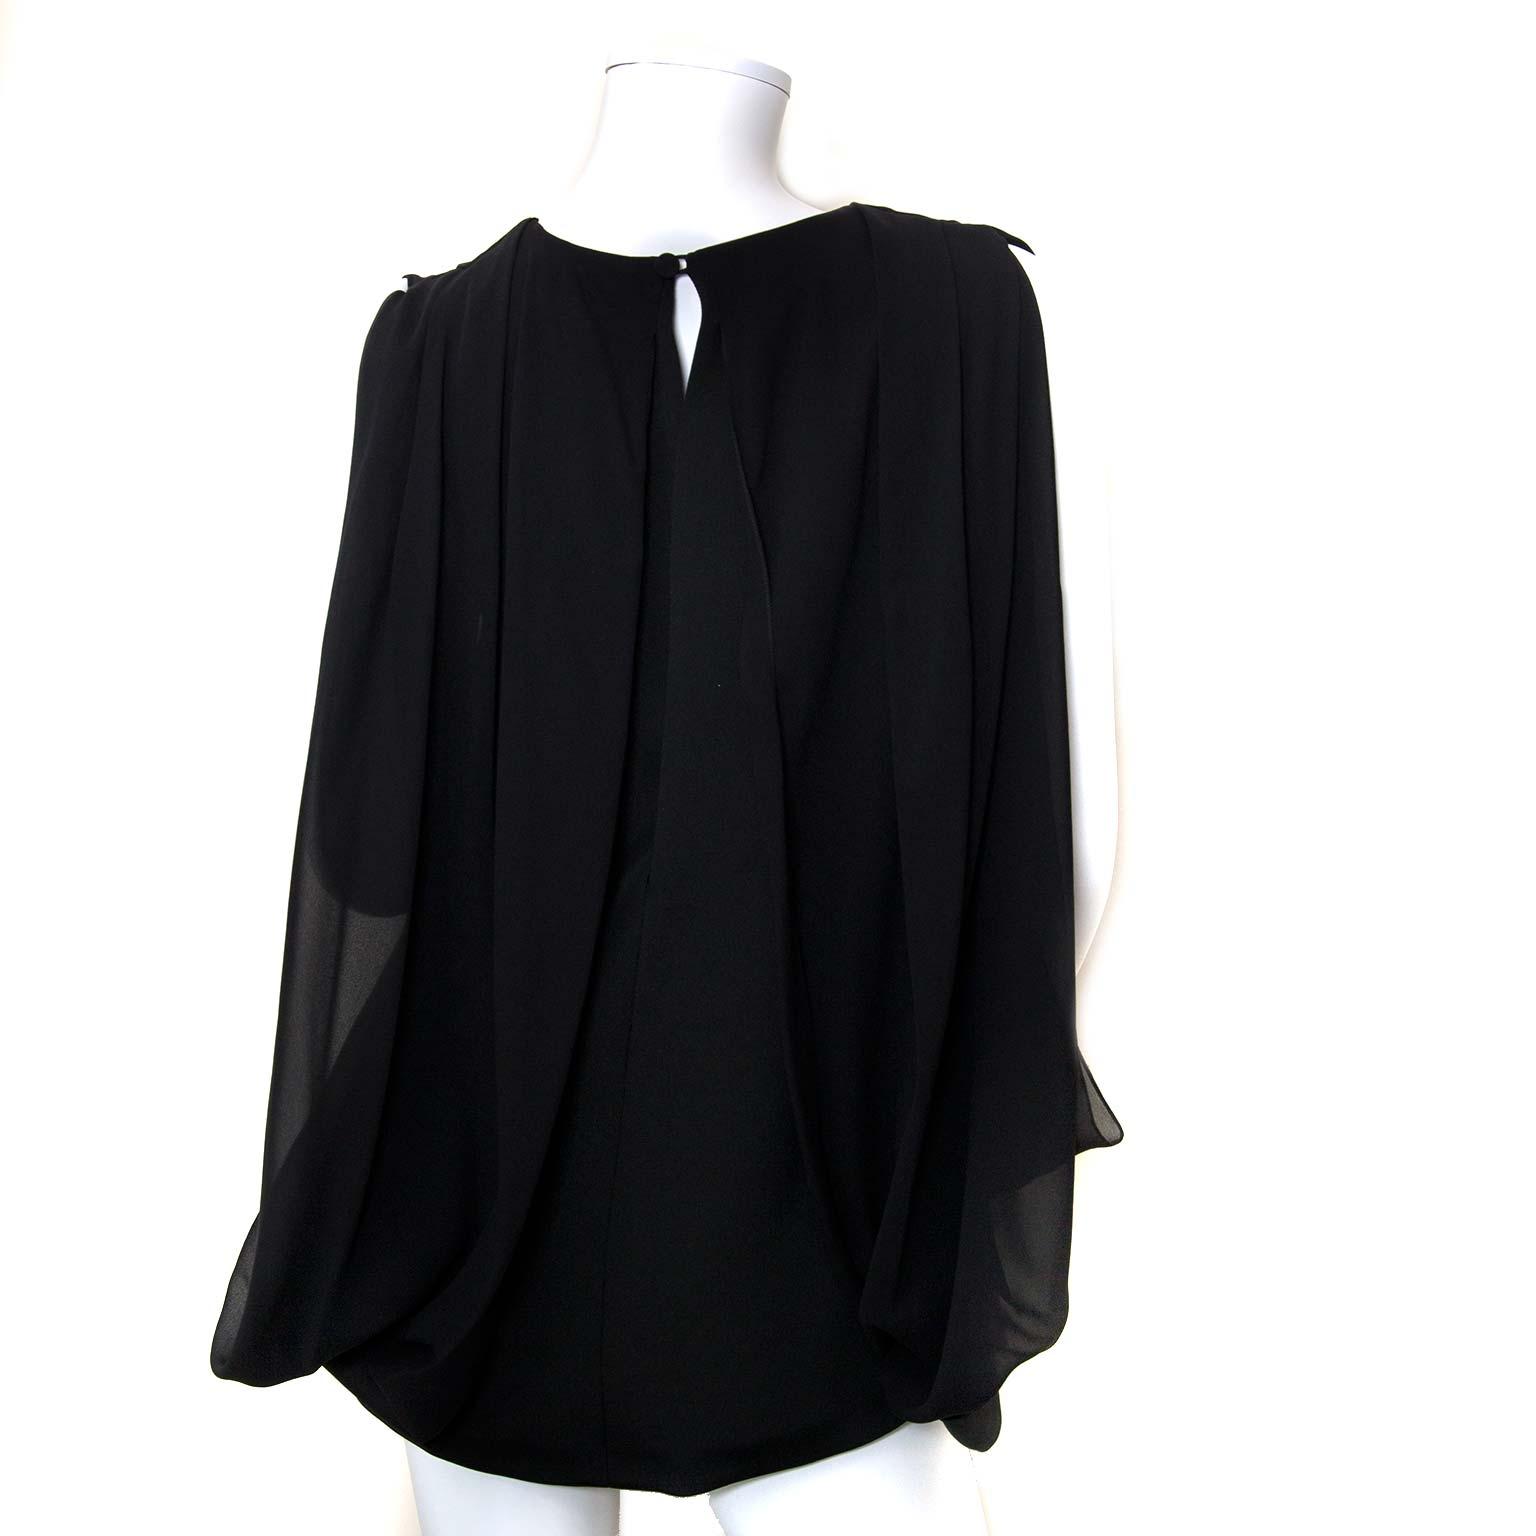 gucci black blouse at labellov vintage fashion webshop belgium